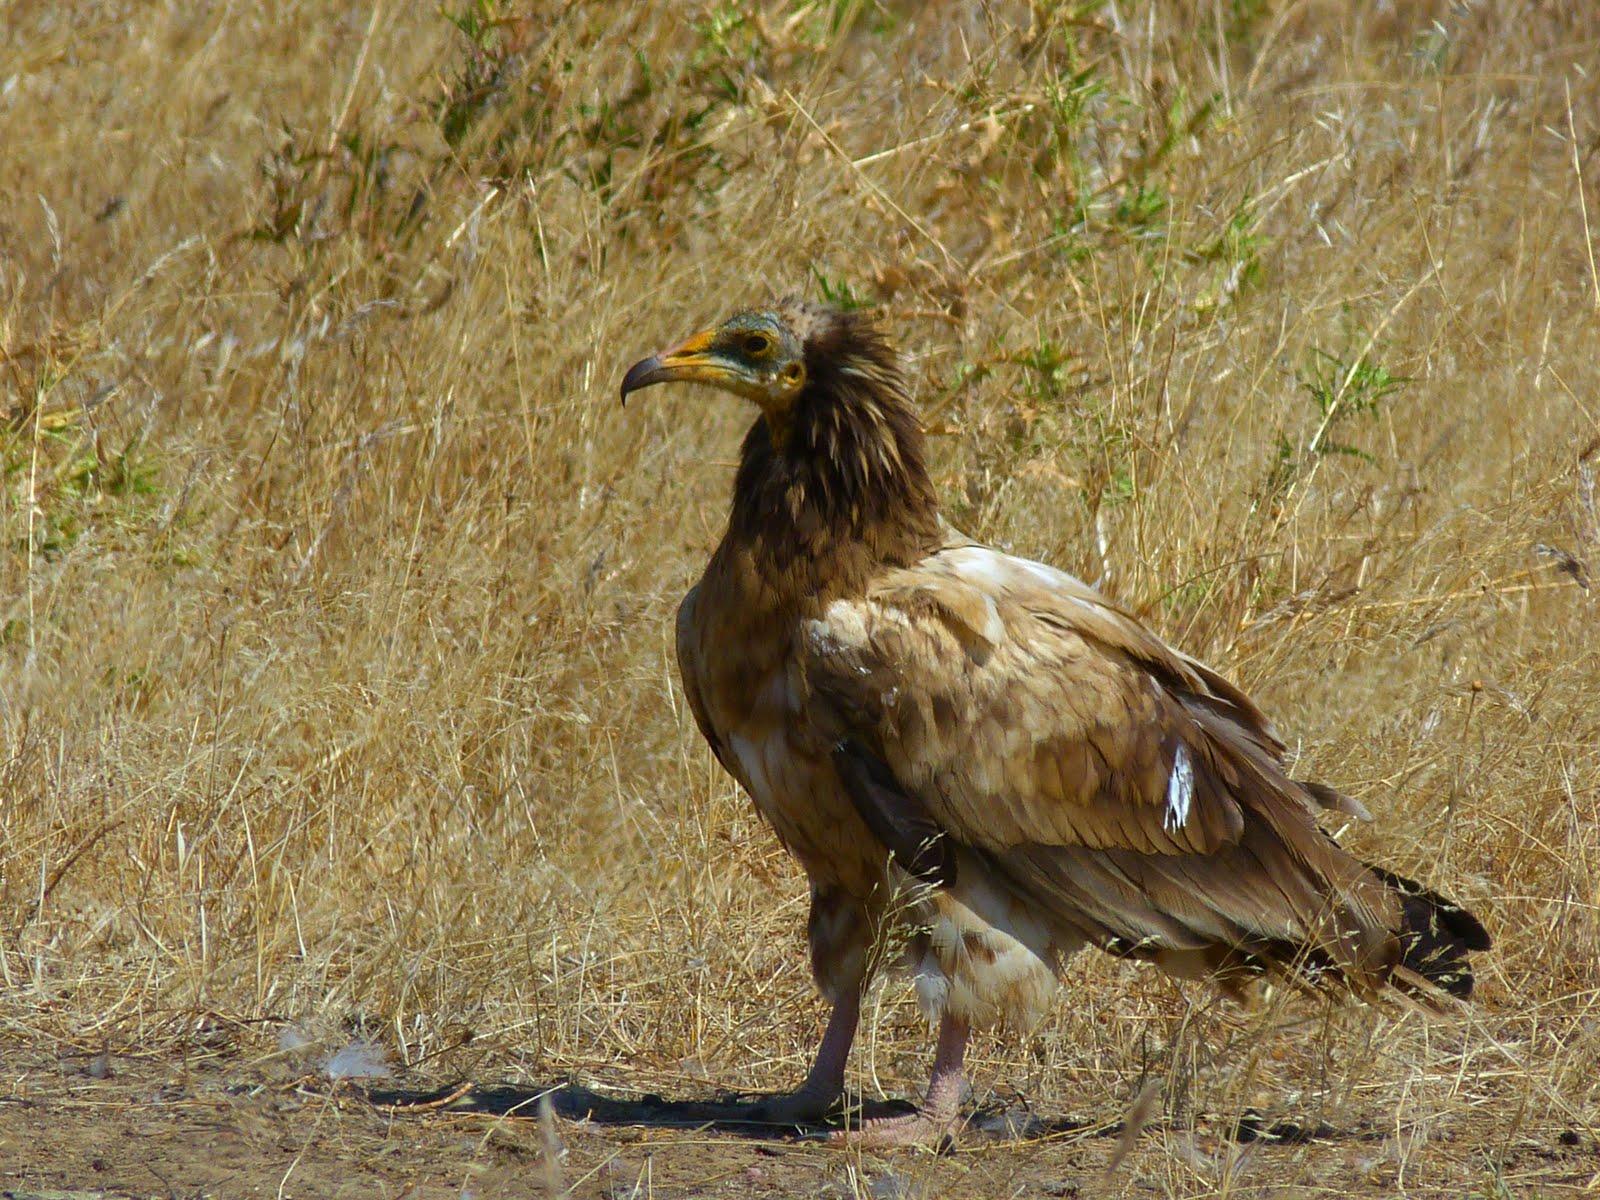 Vultures eating dead animal